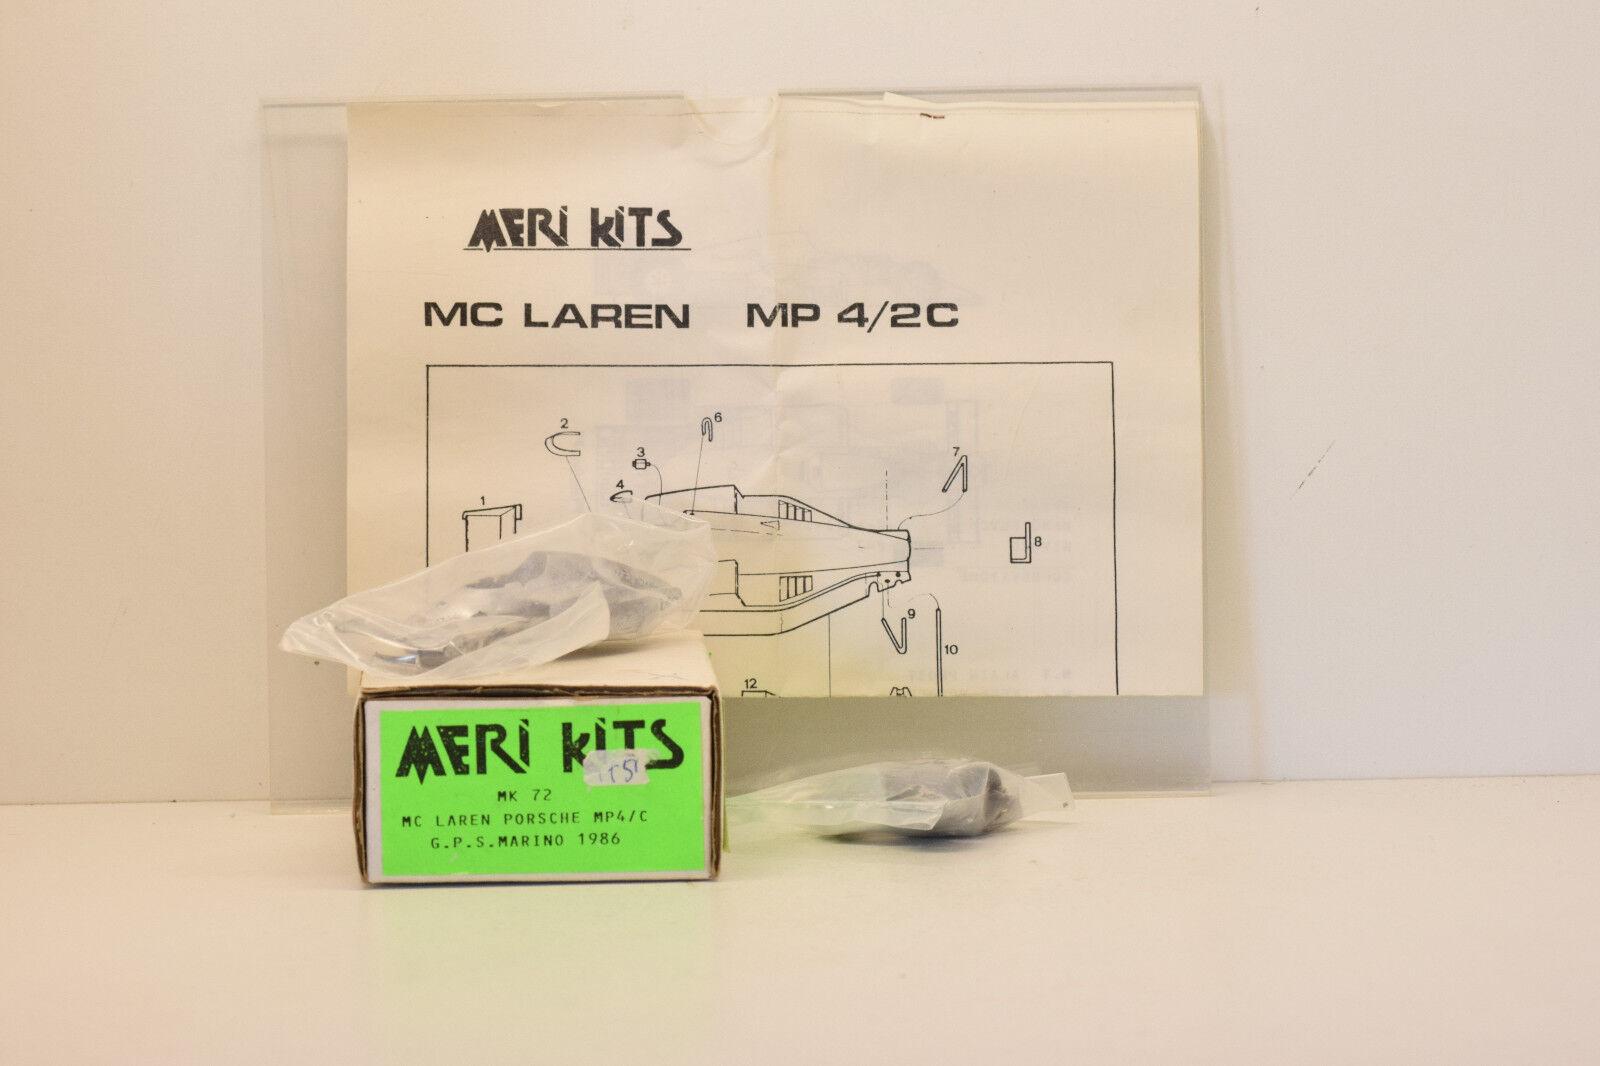 Mp4 c porsche kit mclaren prost gp san marino 1986 meri kits 1 43 new in box